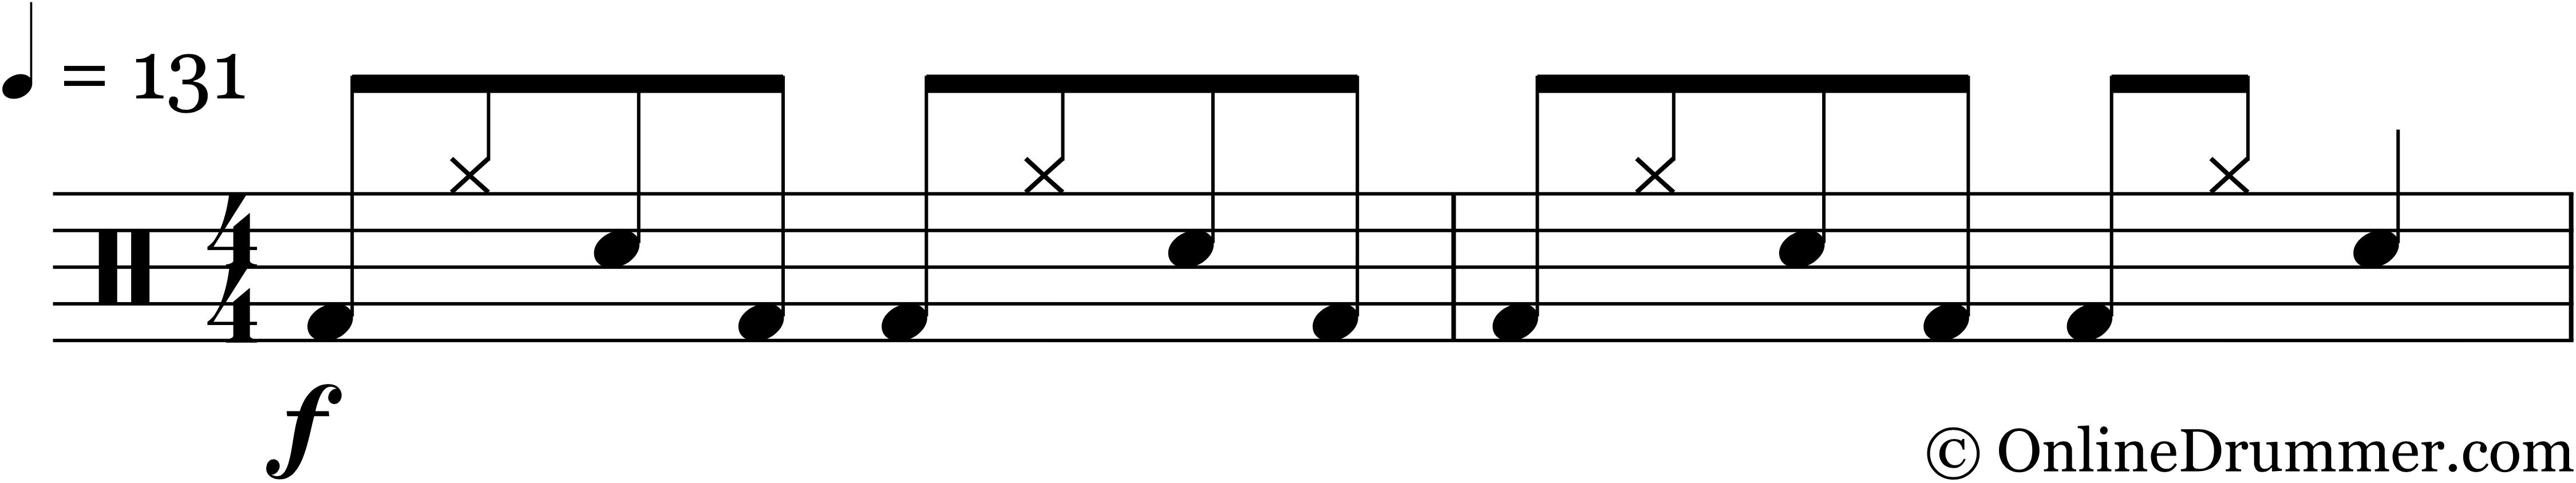 bird of tokyo plans piano sheet music pdf